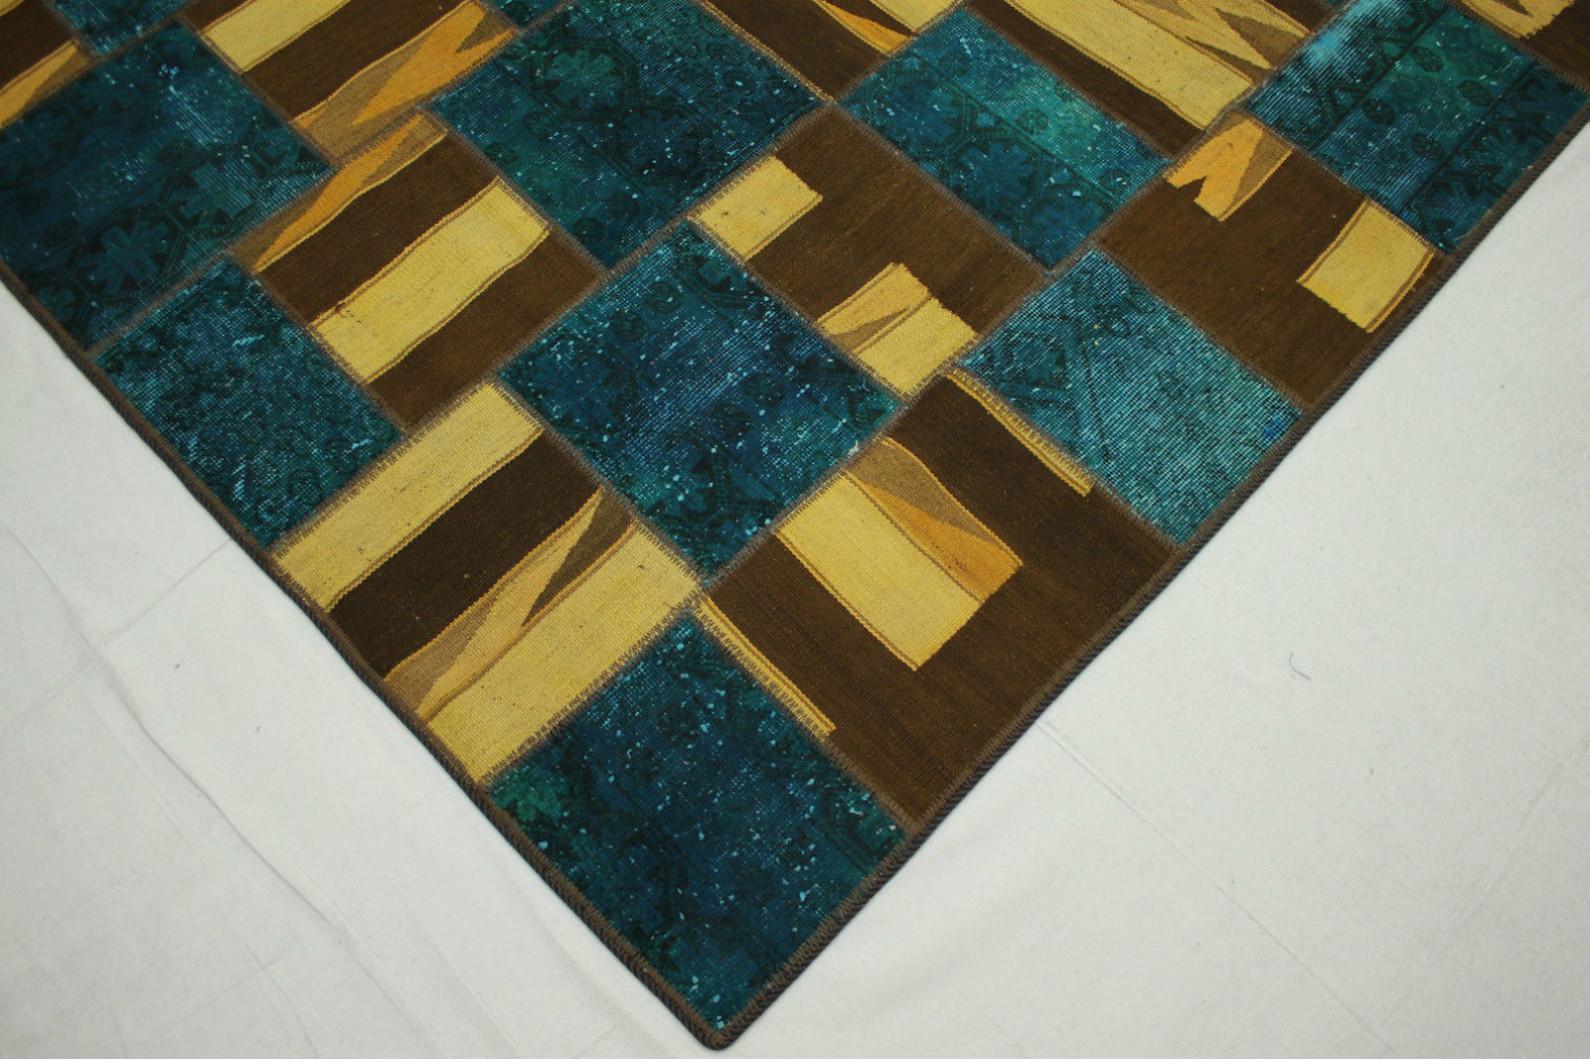 patchwork teppich in 300x200cm 1001 2968 bei carpetido. Black Bedroom Furniture Sets. Home Design Ideas